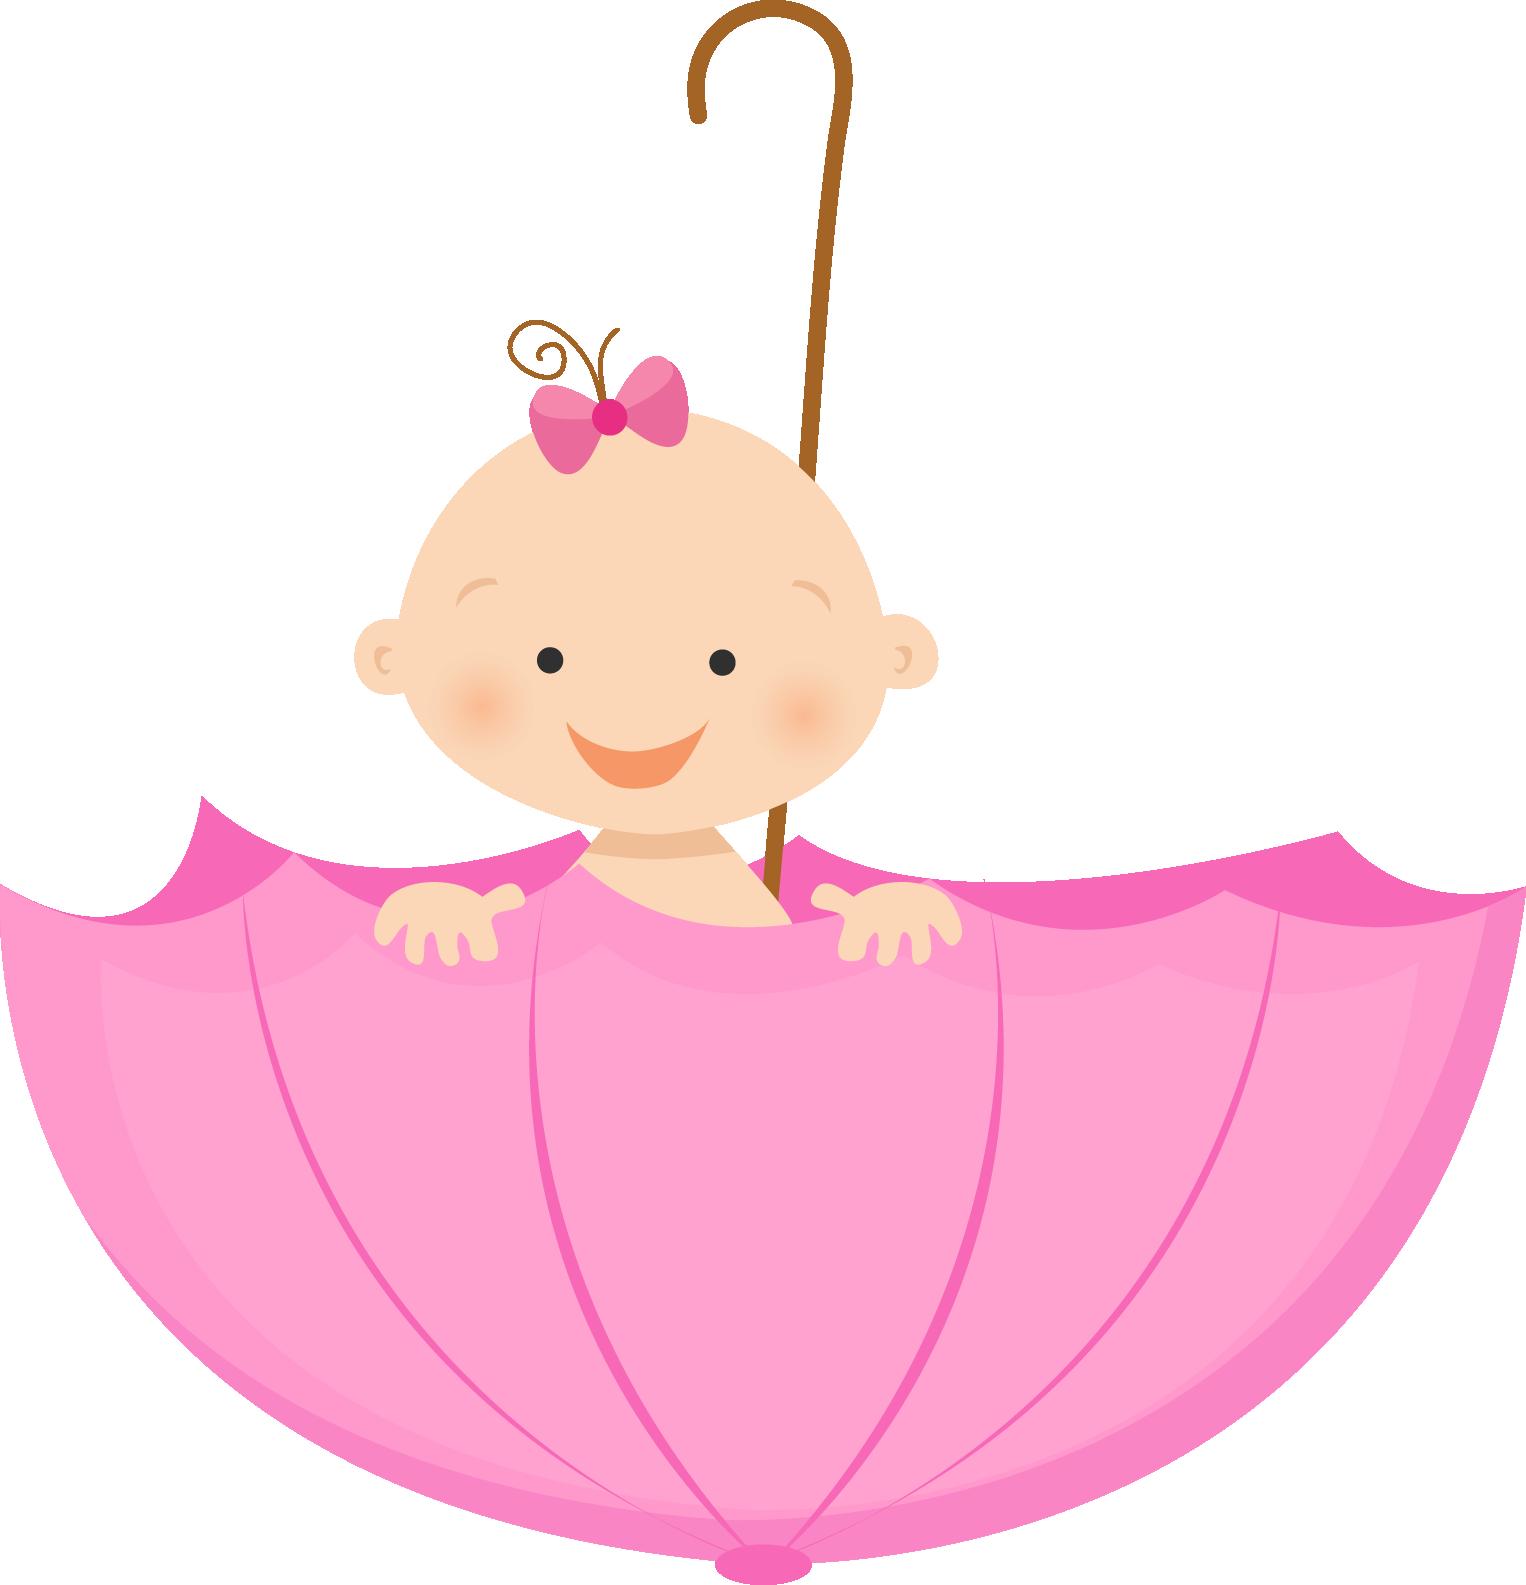 Ch B De Minus Caricatura De Bebe Carritos De Bebe Dibujo De Bebe